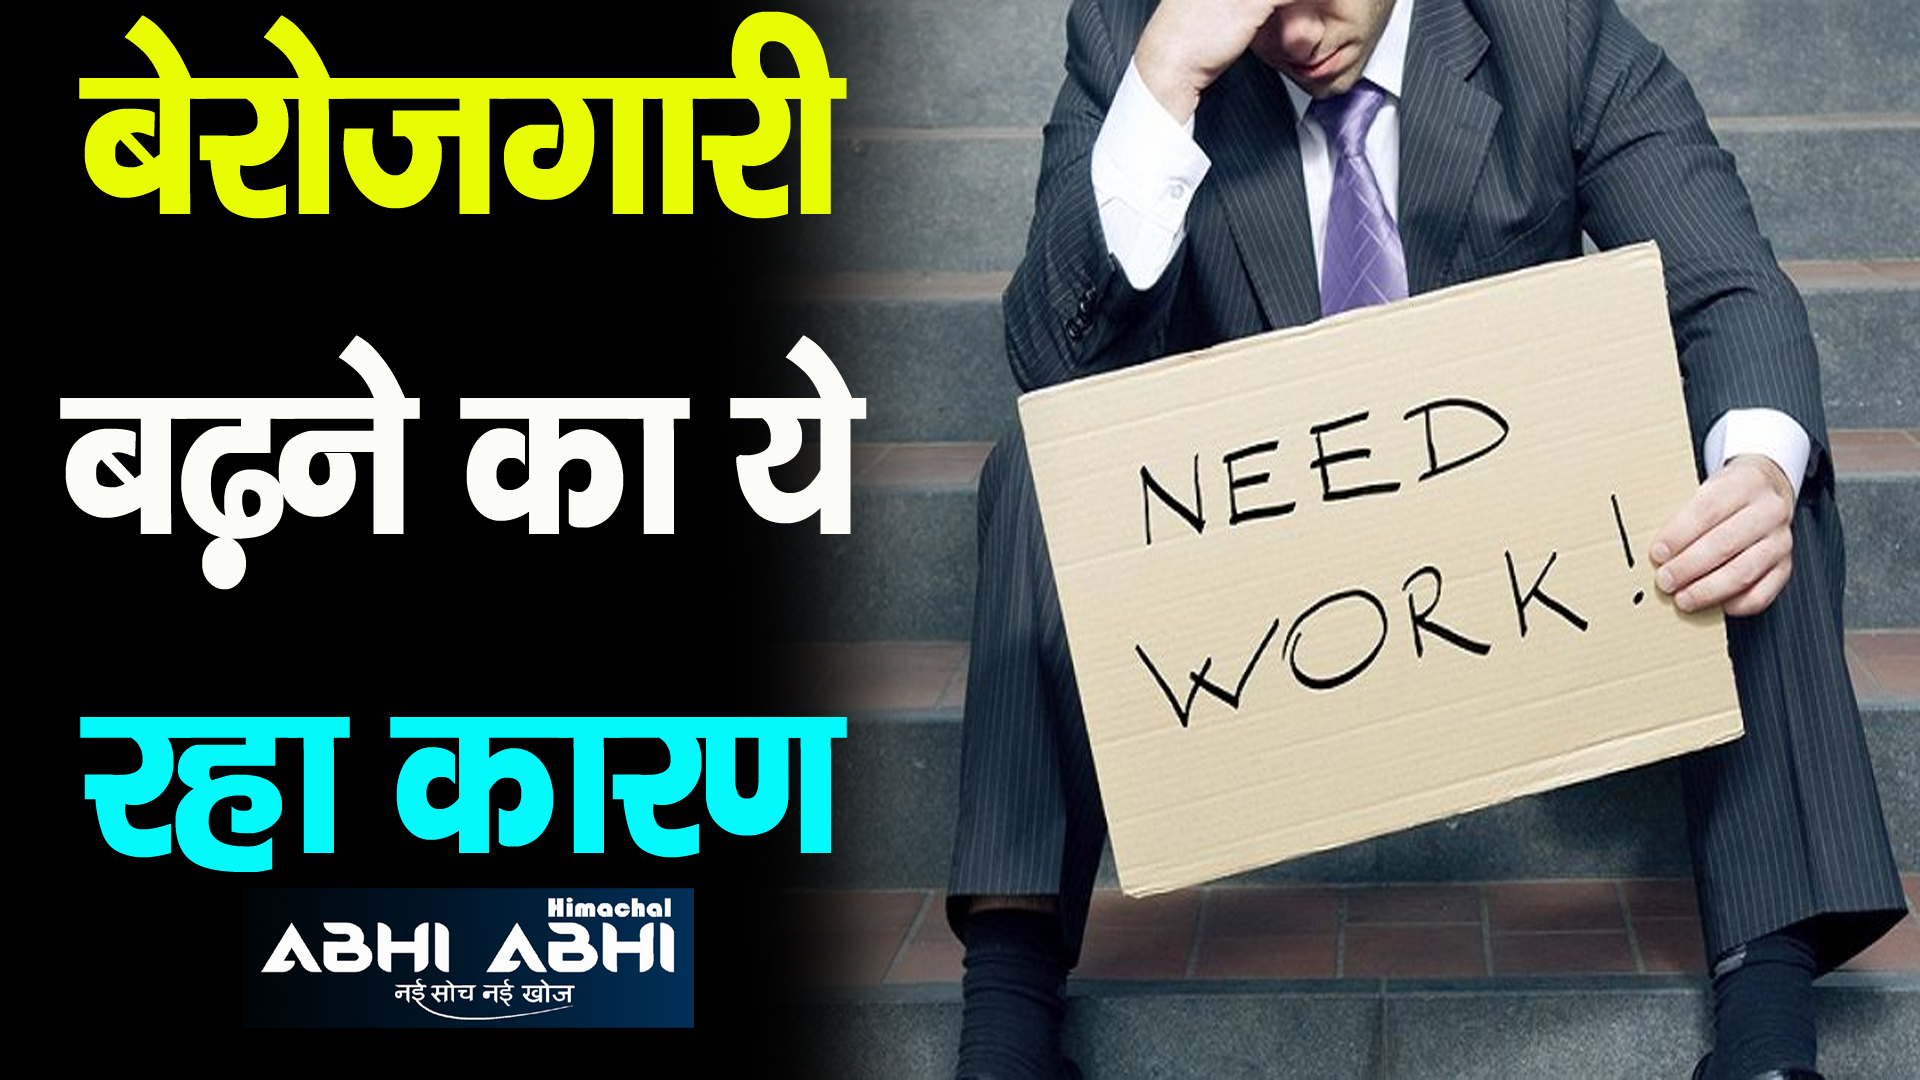 बेरोजगारी बढ़ने का ये रहा कारण